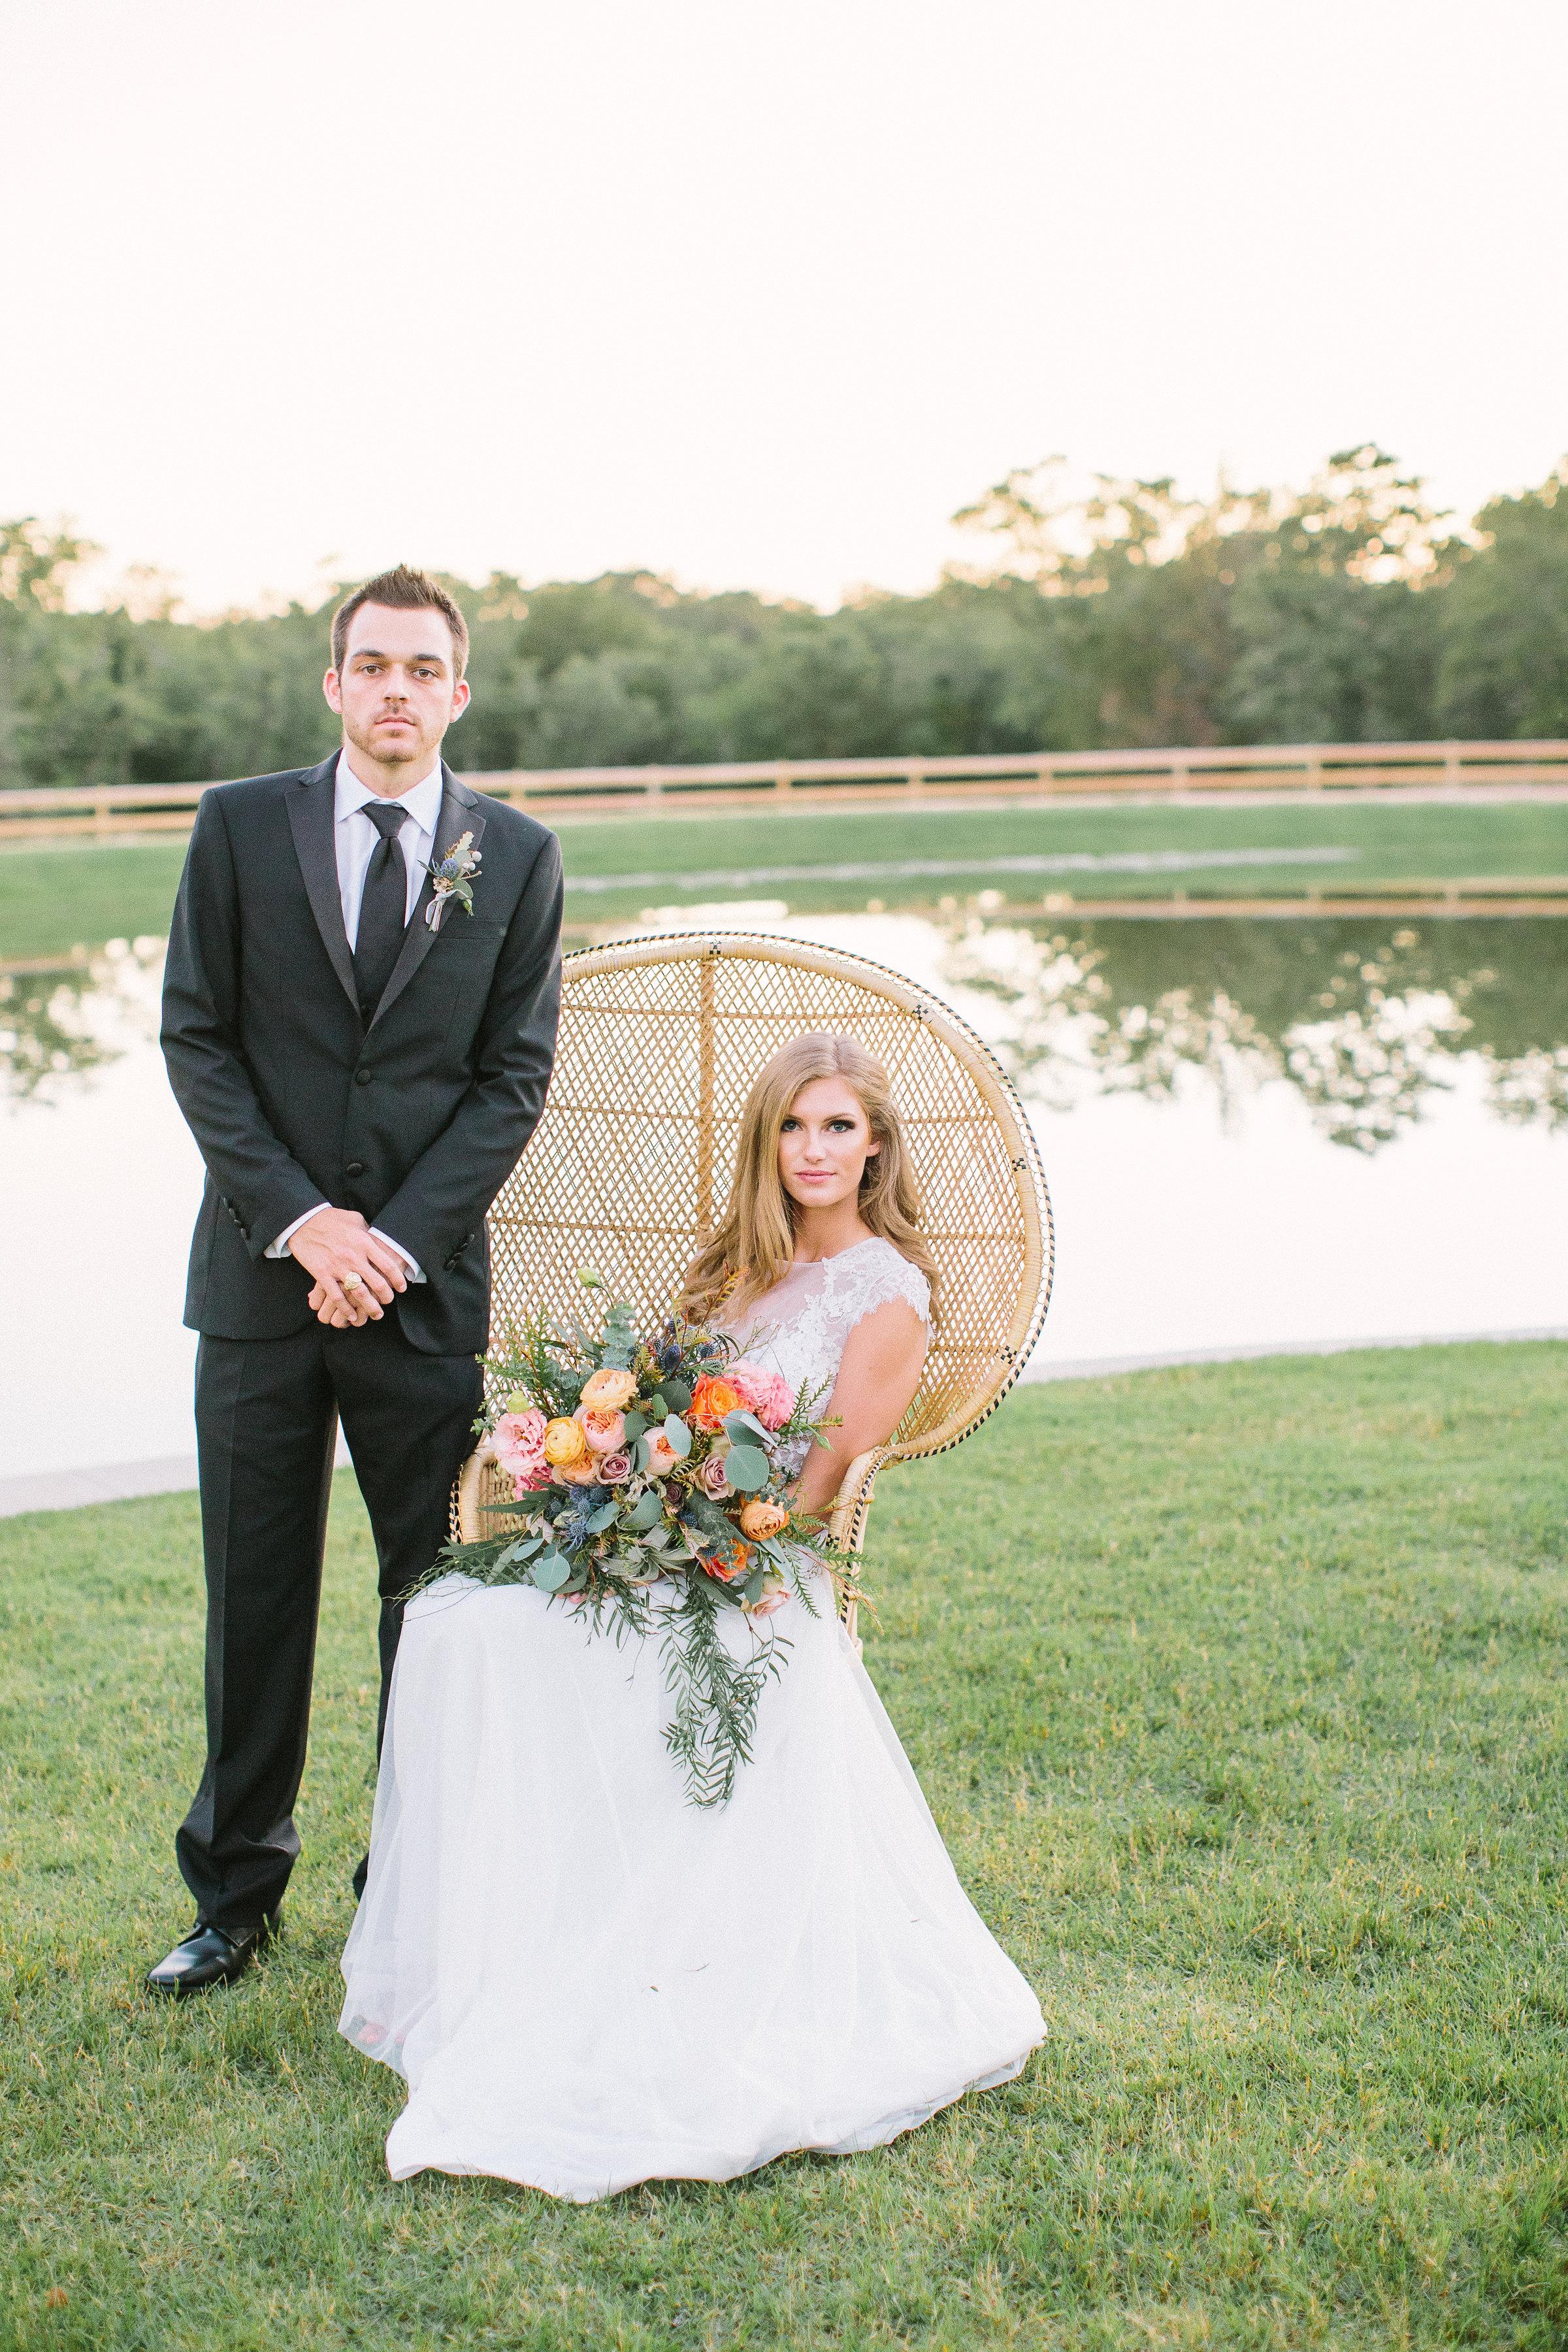 Ellen-Ashton-Photography-Peach-Creek-Ranch-Weddings-Wed-and-Prosper395